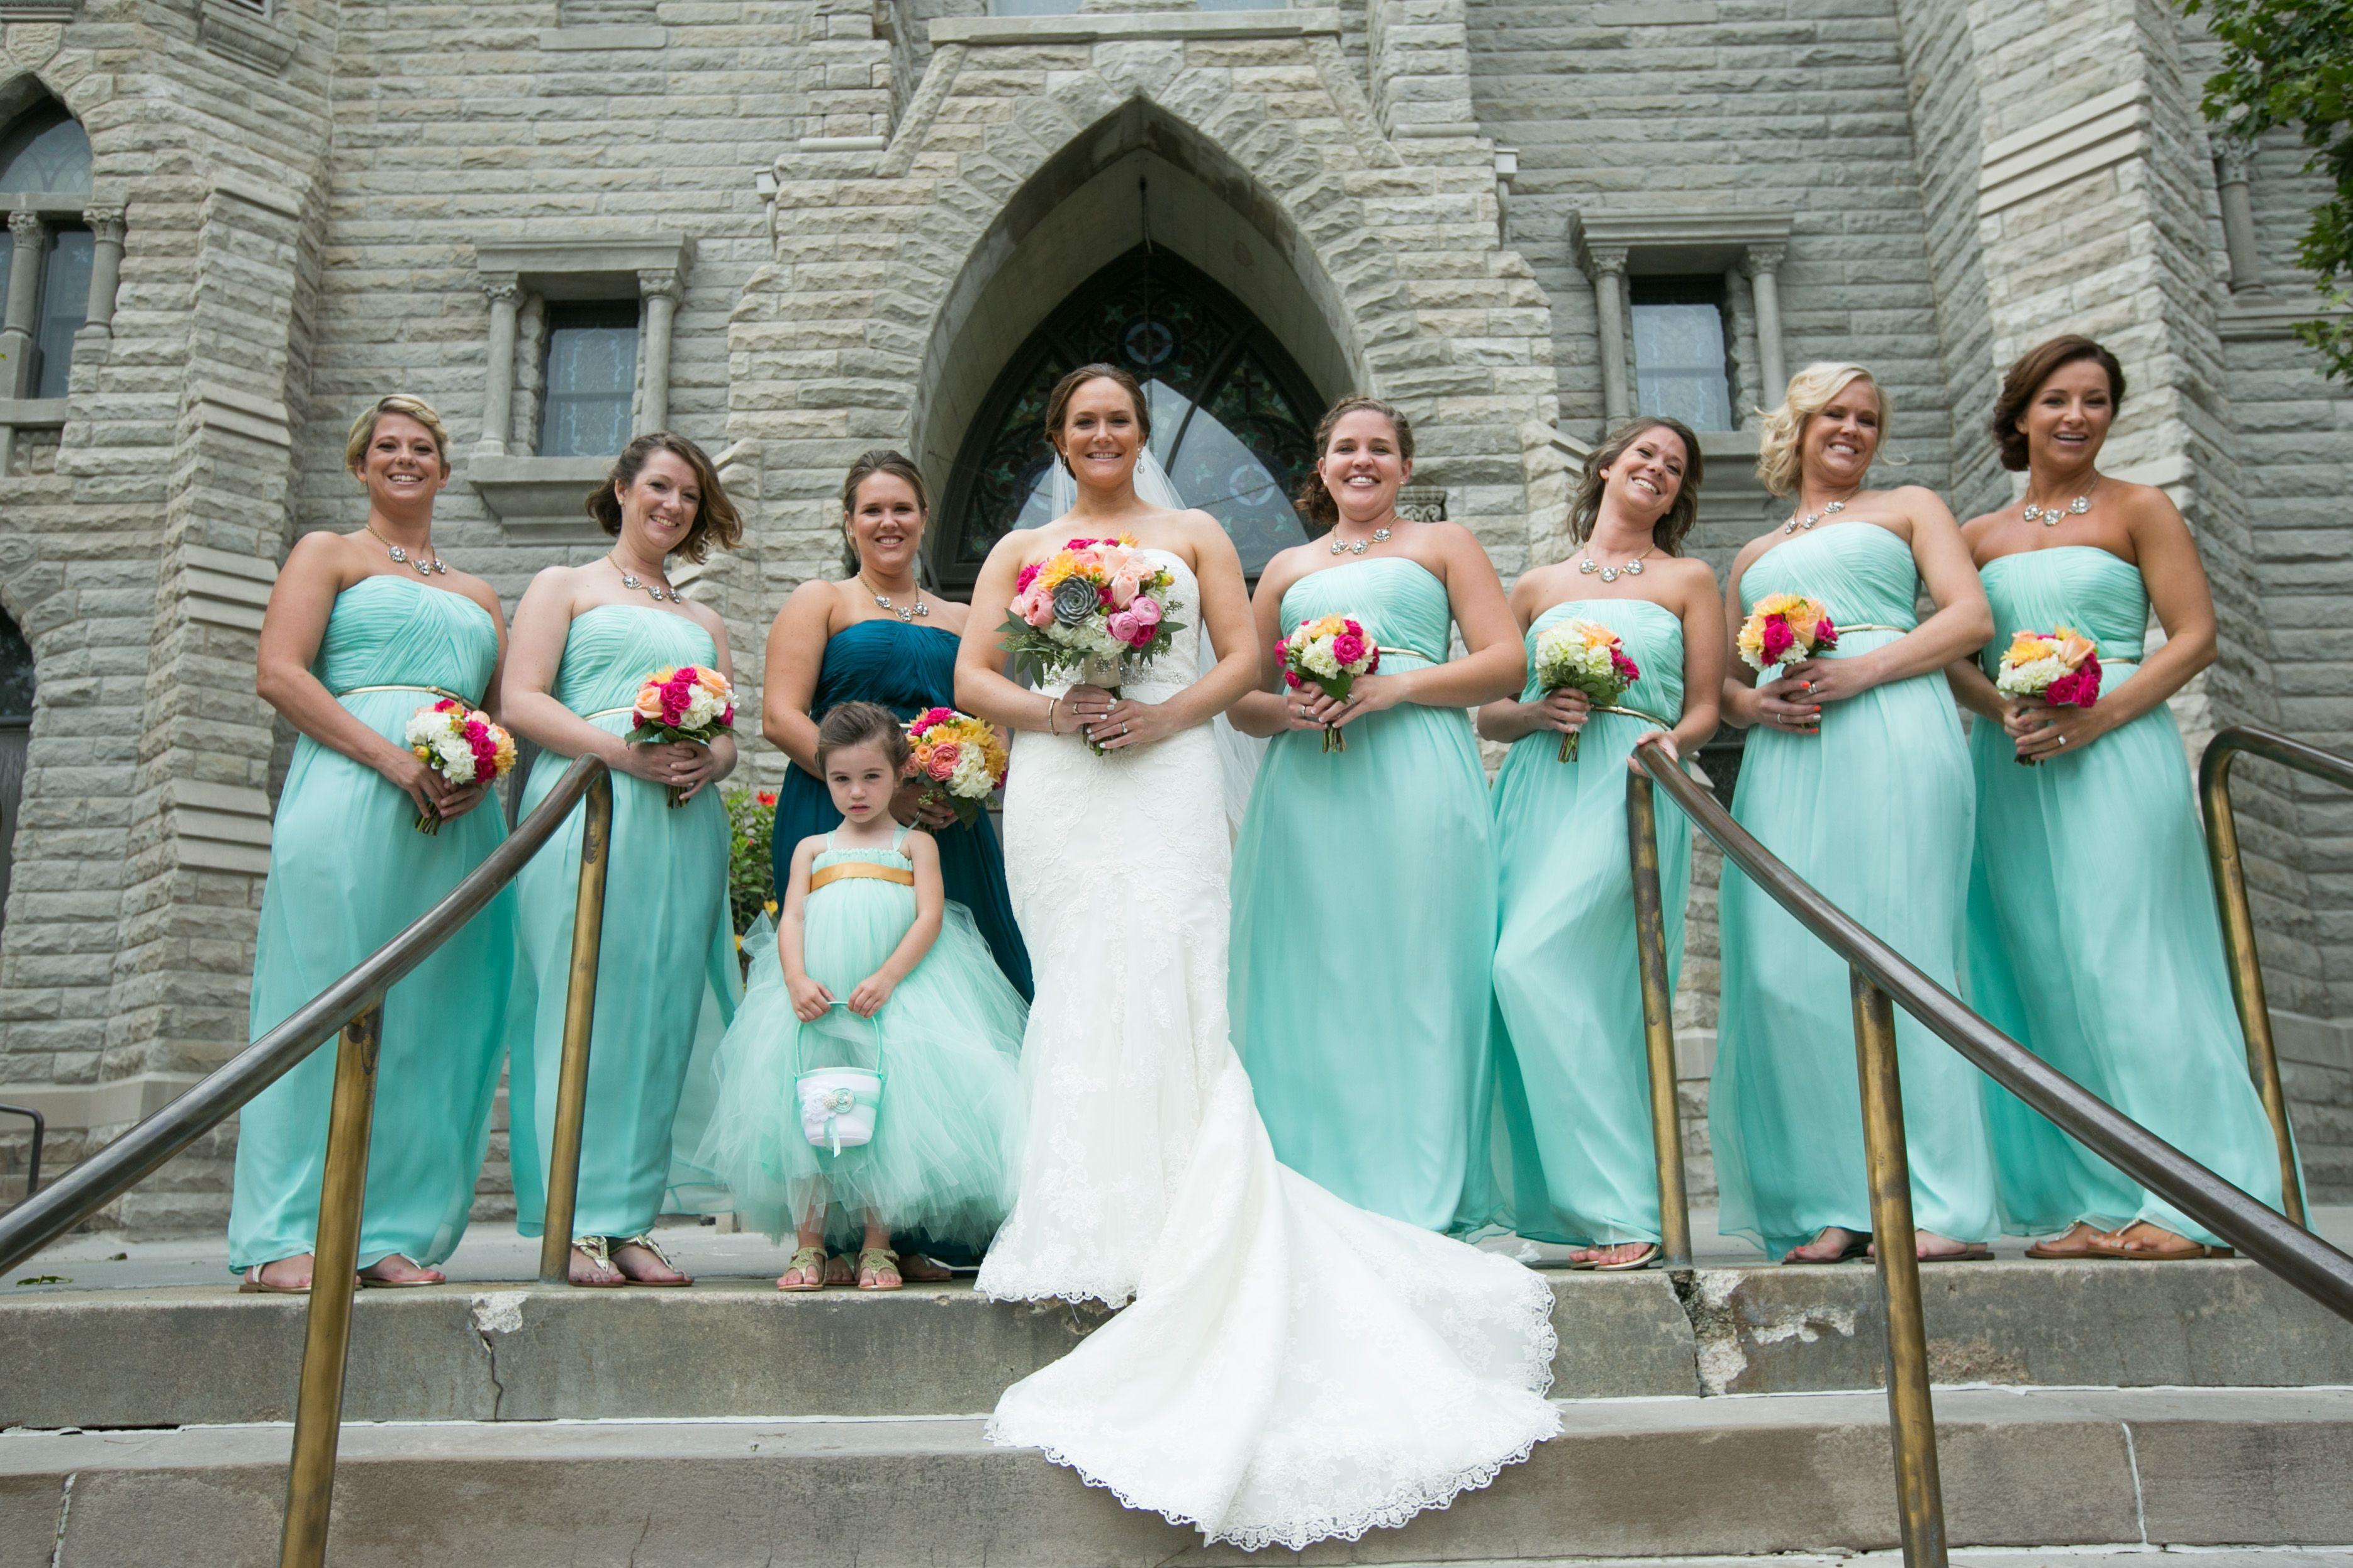 Maren pats wedding classic omaha wedding doon1018 maren pats wedding classic omaha wedding doon1018 donnamorgan bridesmaids dresses in ombrellifo Choice Image